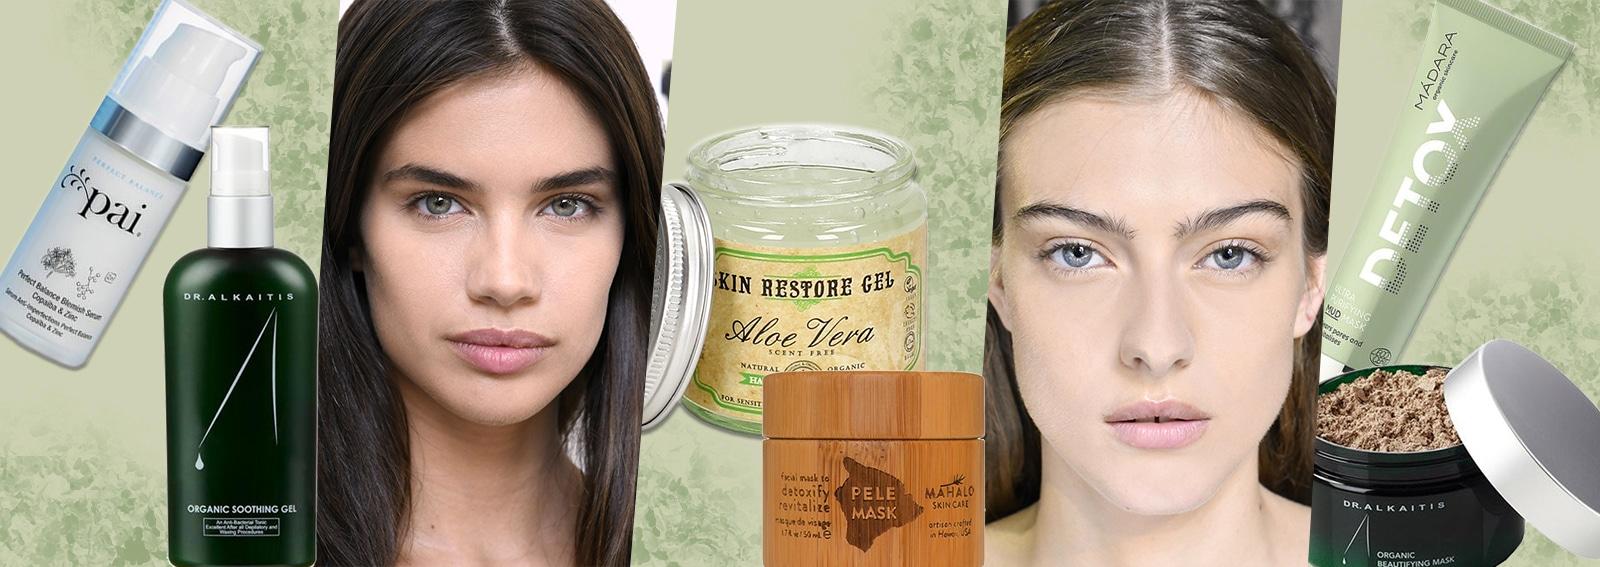 acne-prodotti-bio_desktop